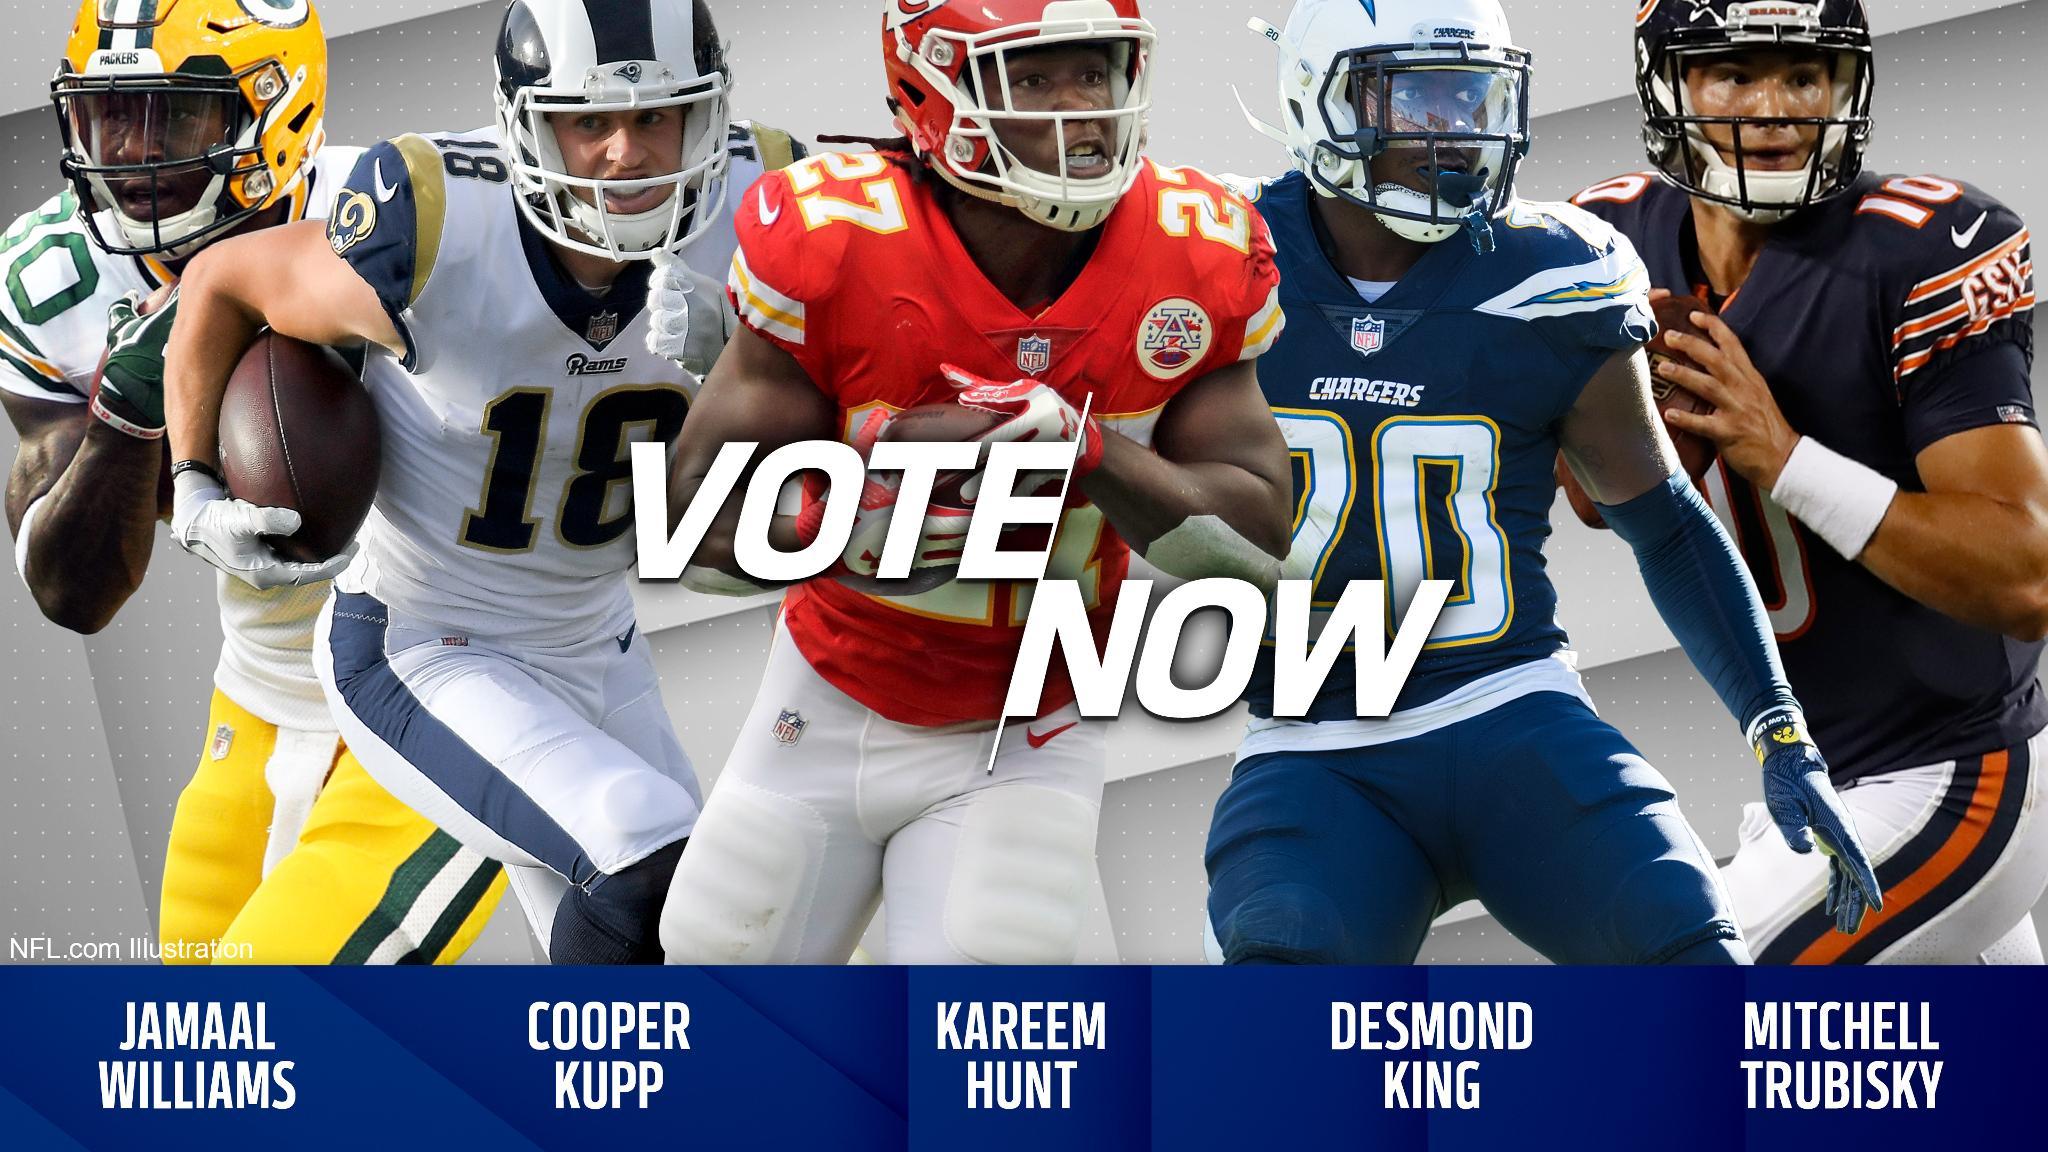 VOTE for the @pepsi Rookie of the Week!  Tweet player's name + #NFLROTW: Williams. Kupp. Hunt. King. Trubisky. https://t.co/5qqmg3QTQA